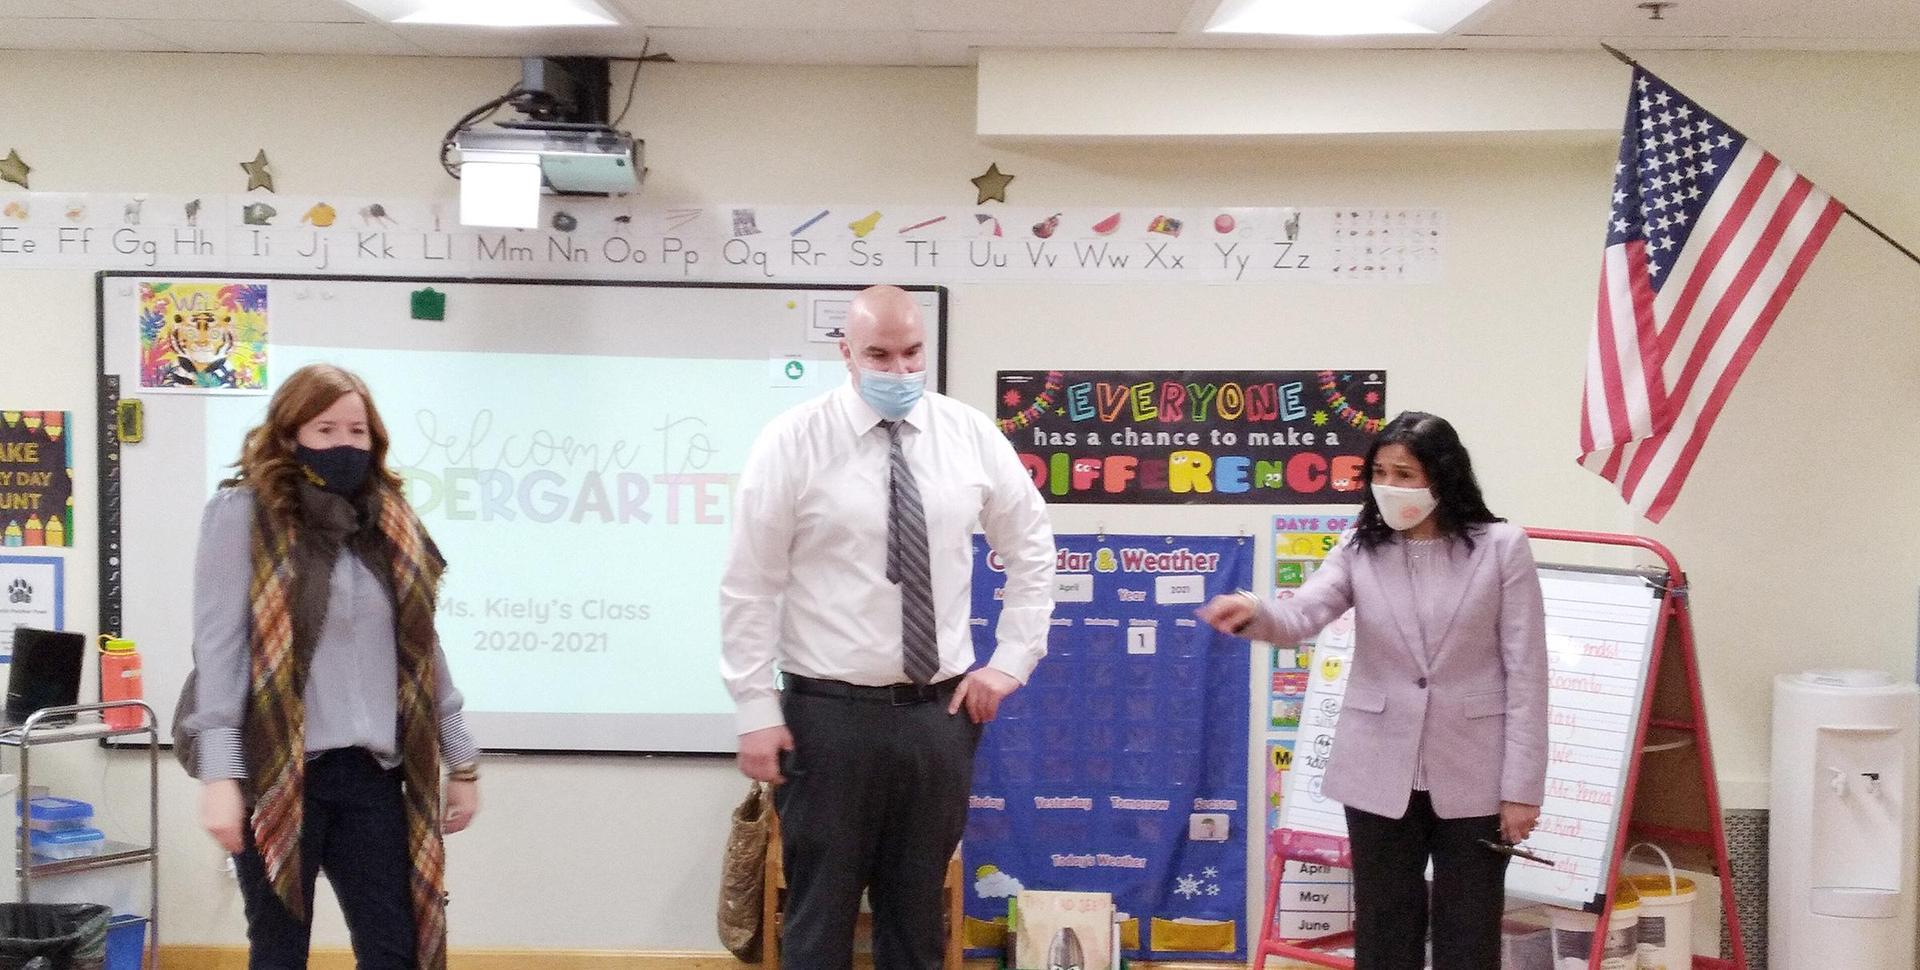 Three educators at the front of a classroom, no students visible